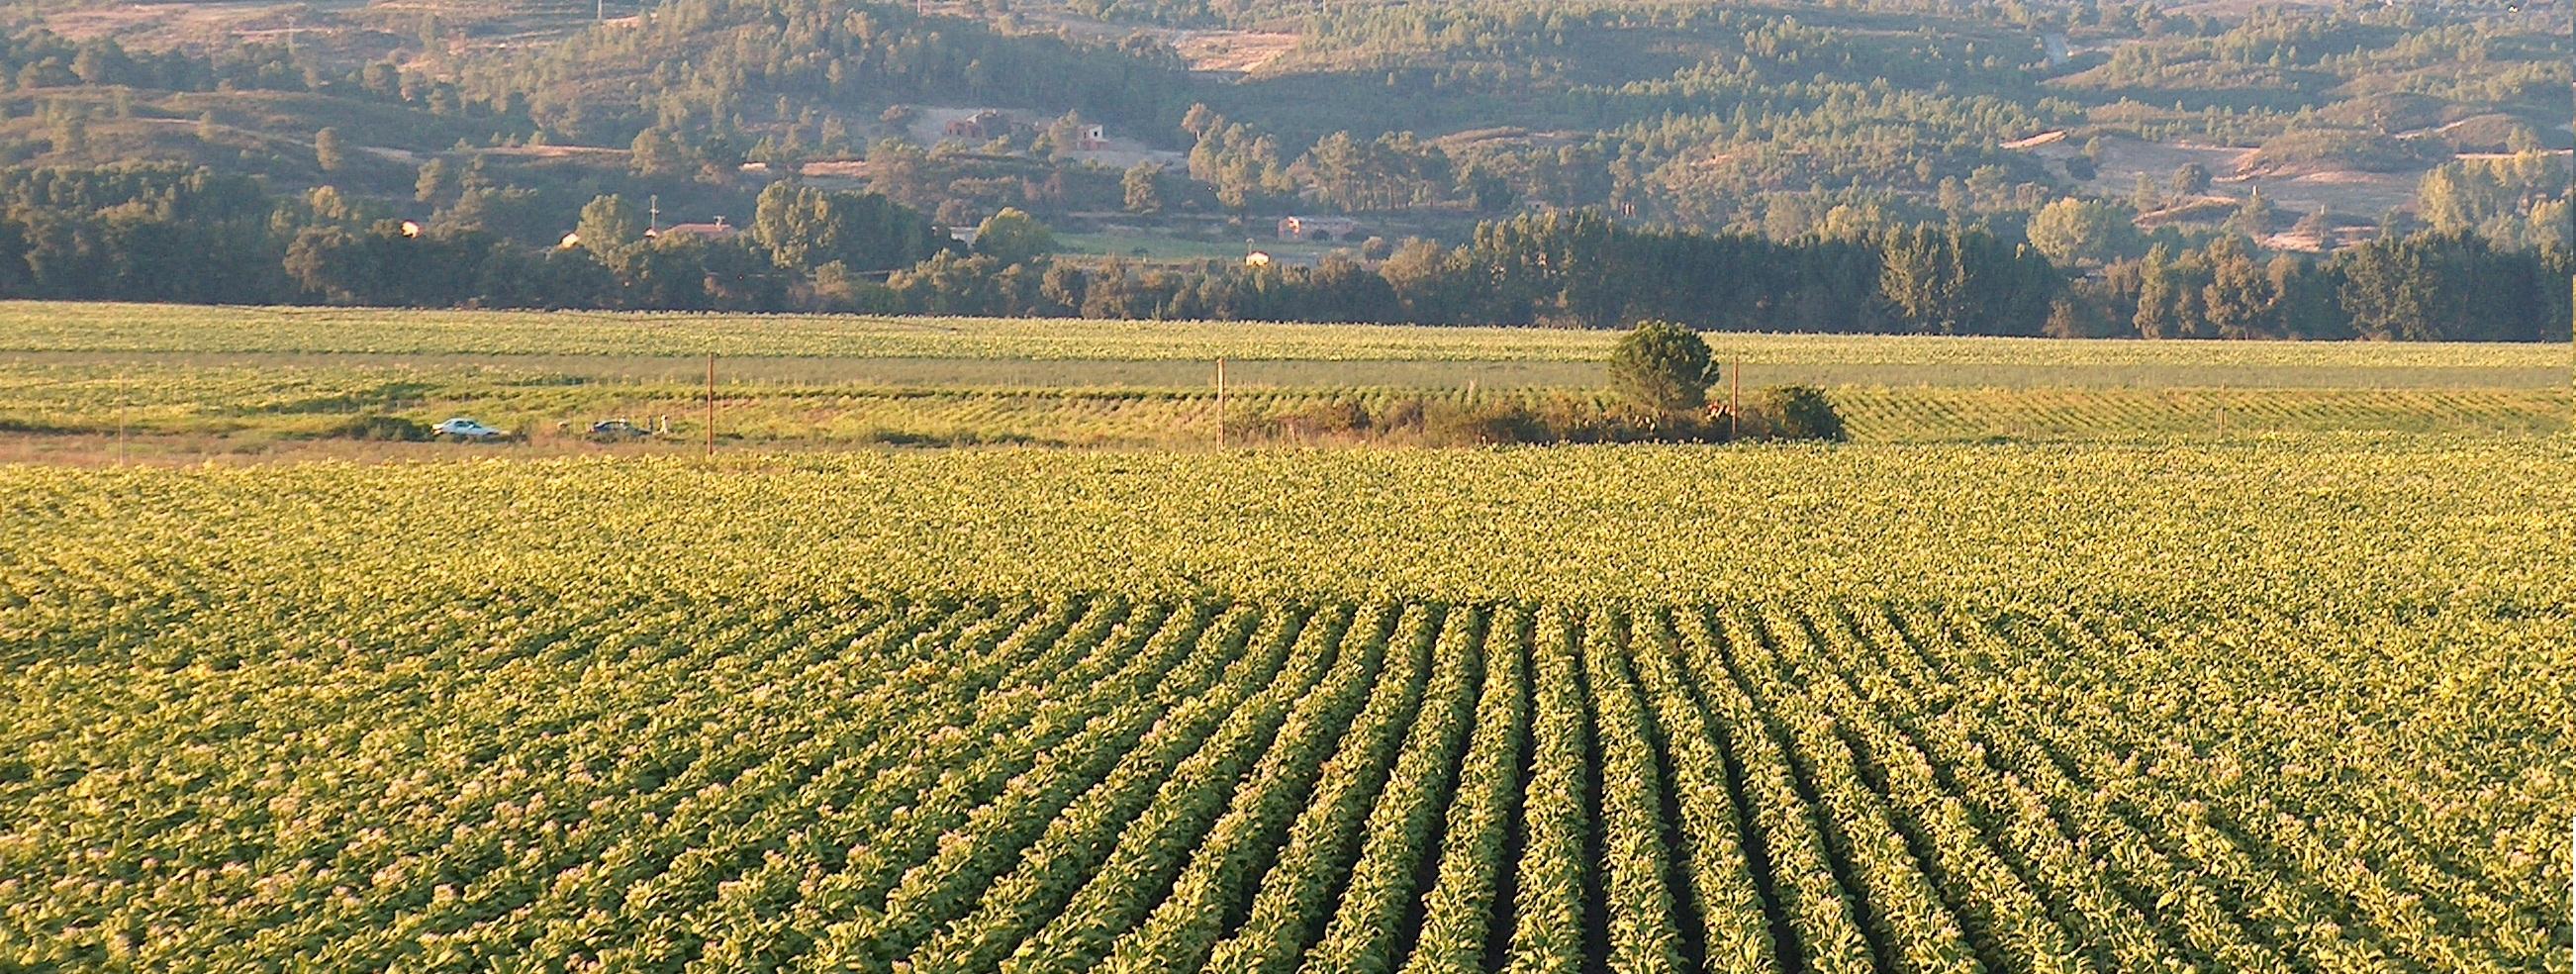 Paisaje de campos de cultivo de tabaco